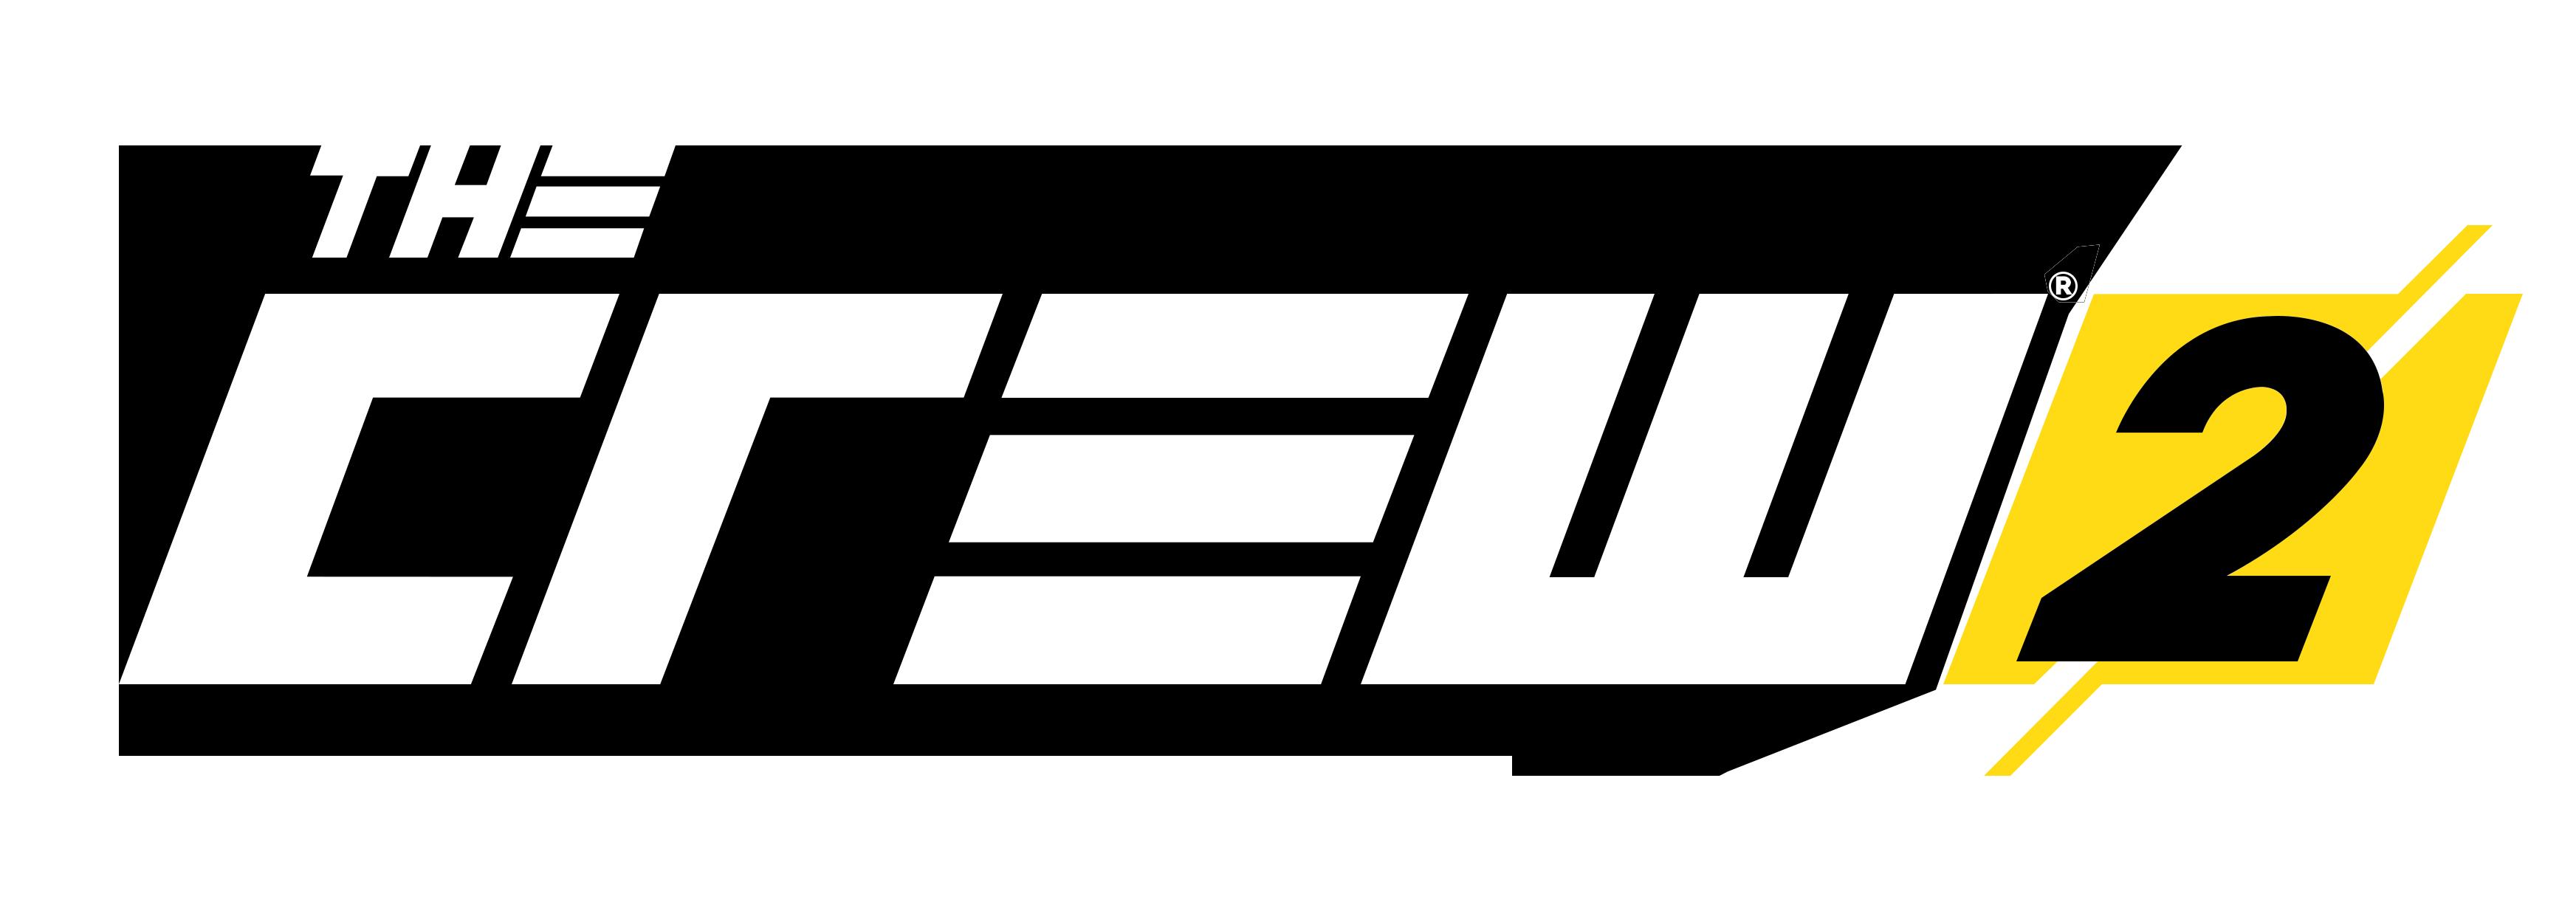 Aesthetic Phone Logo Png